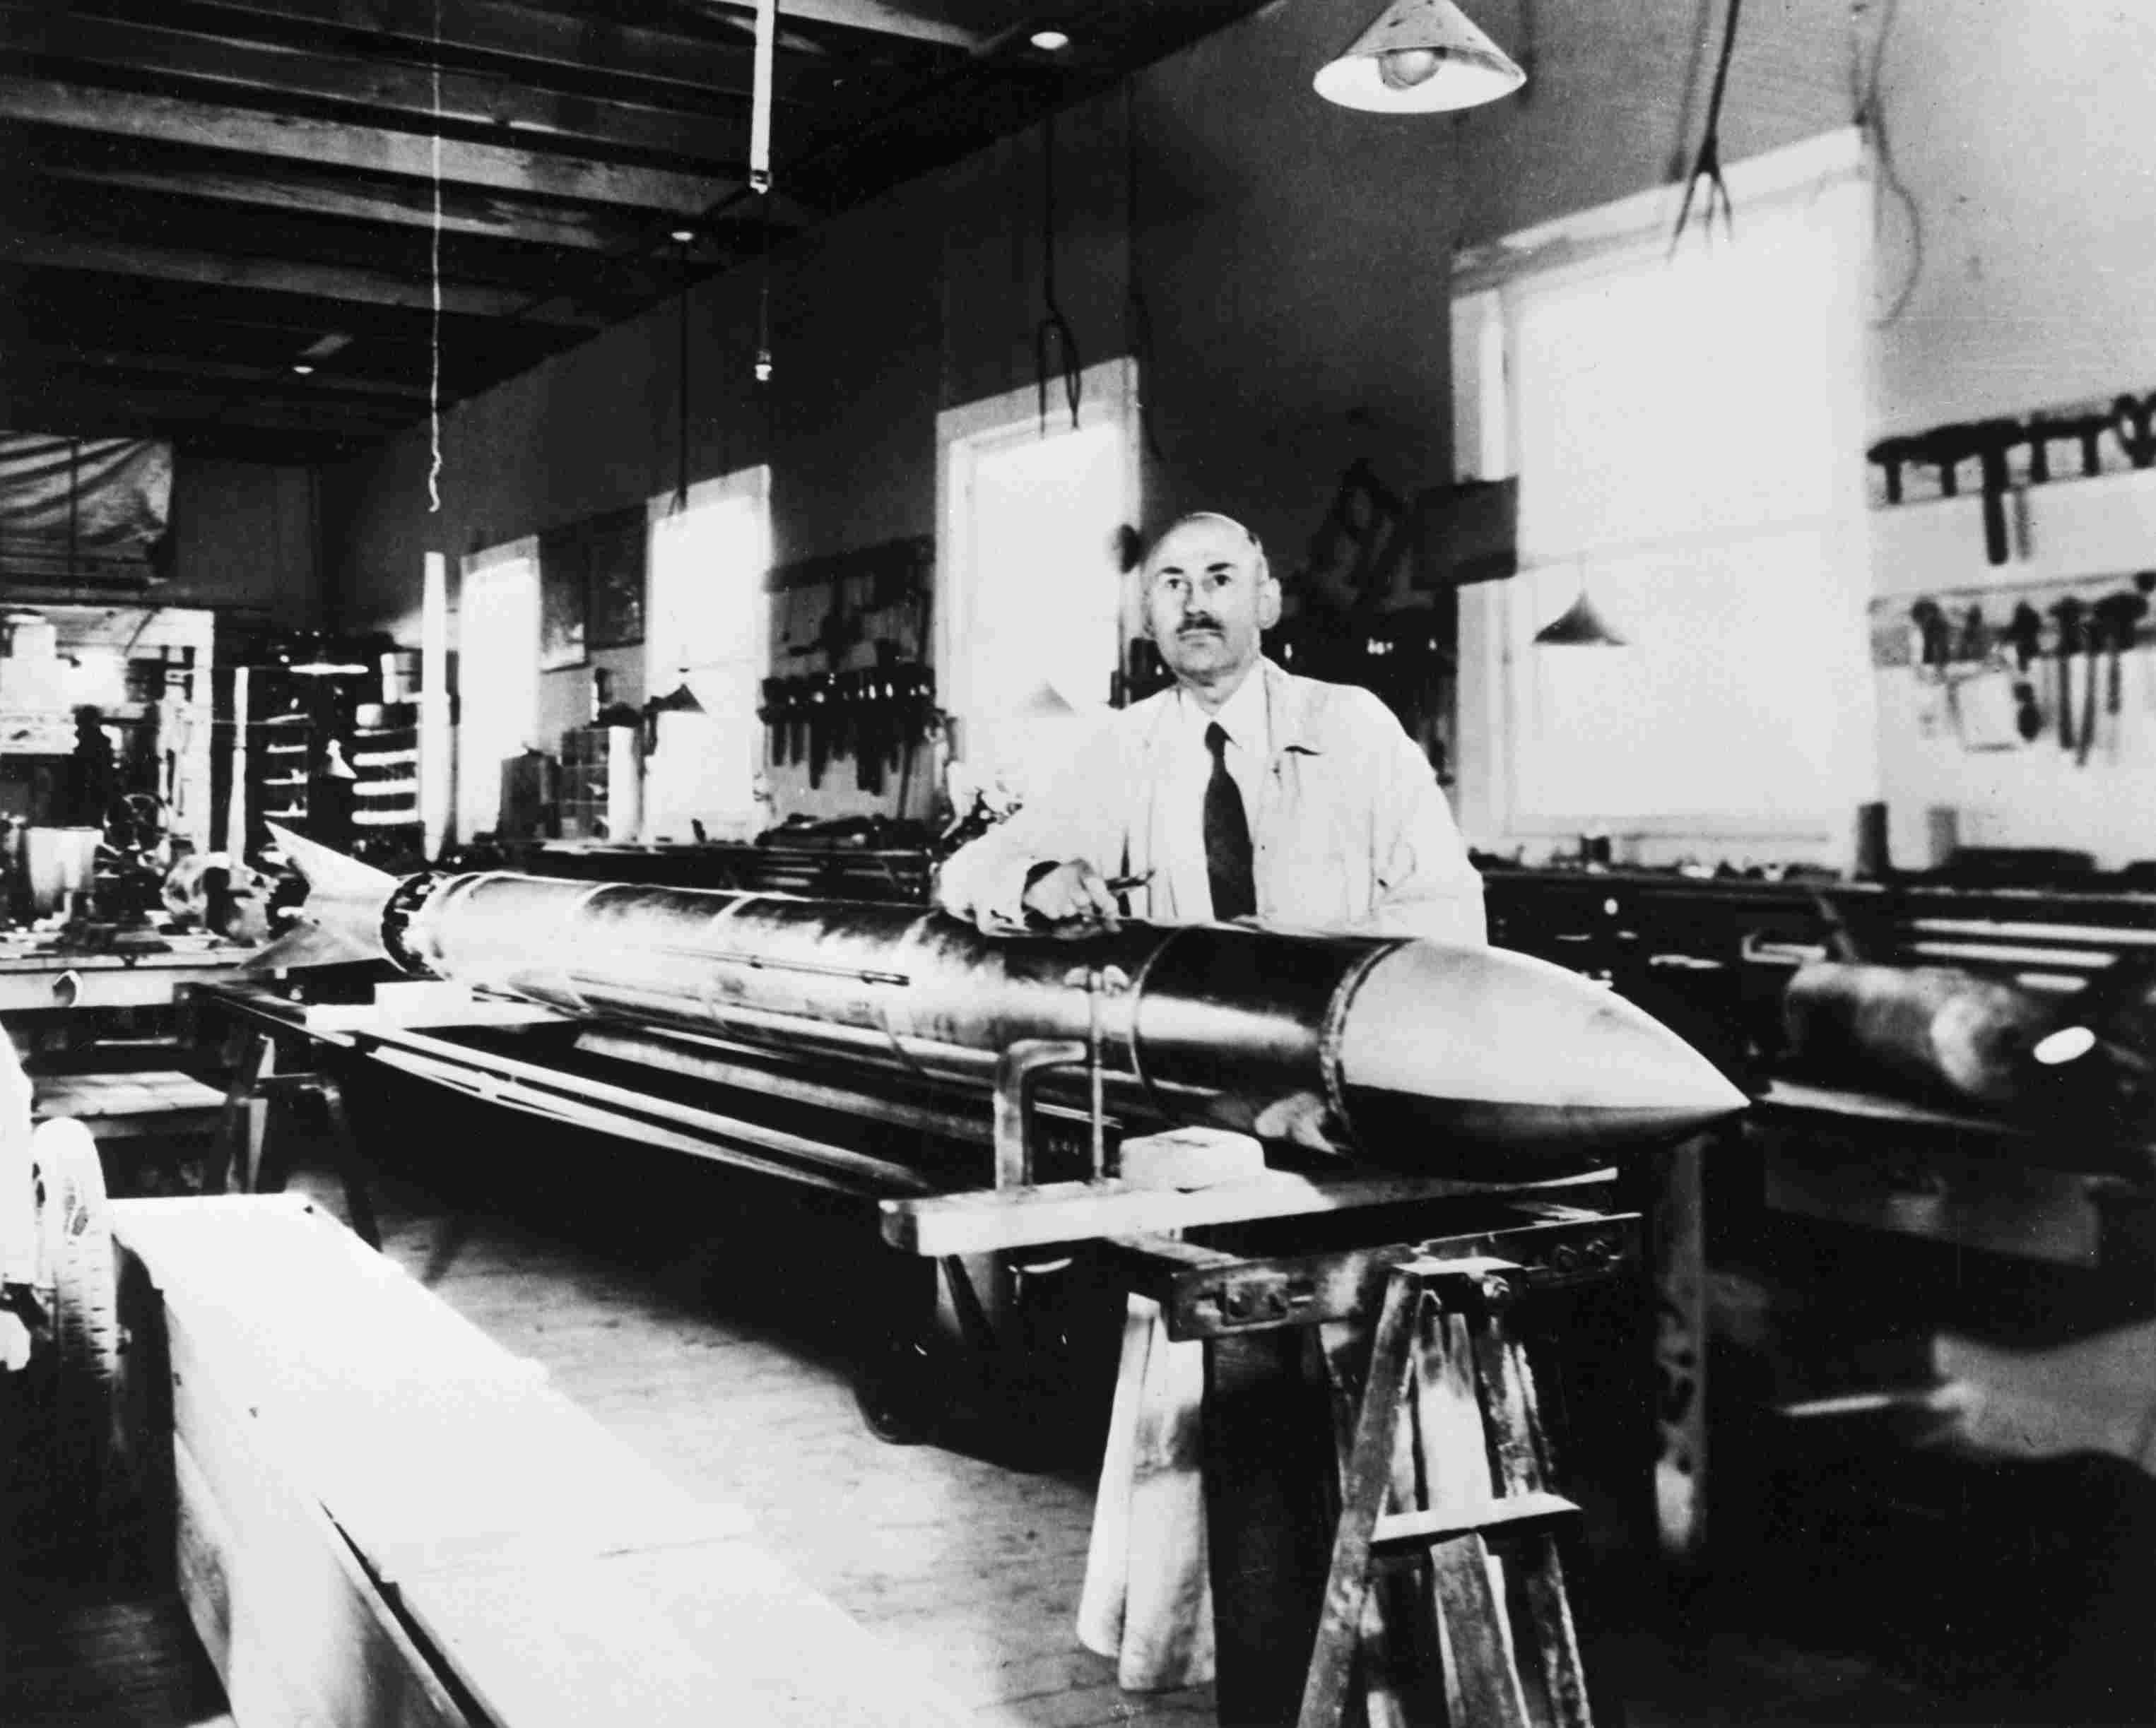 Robert H. Goddard with Rocket